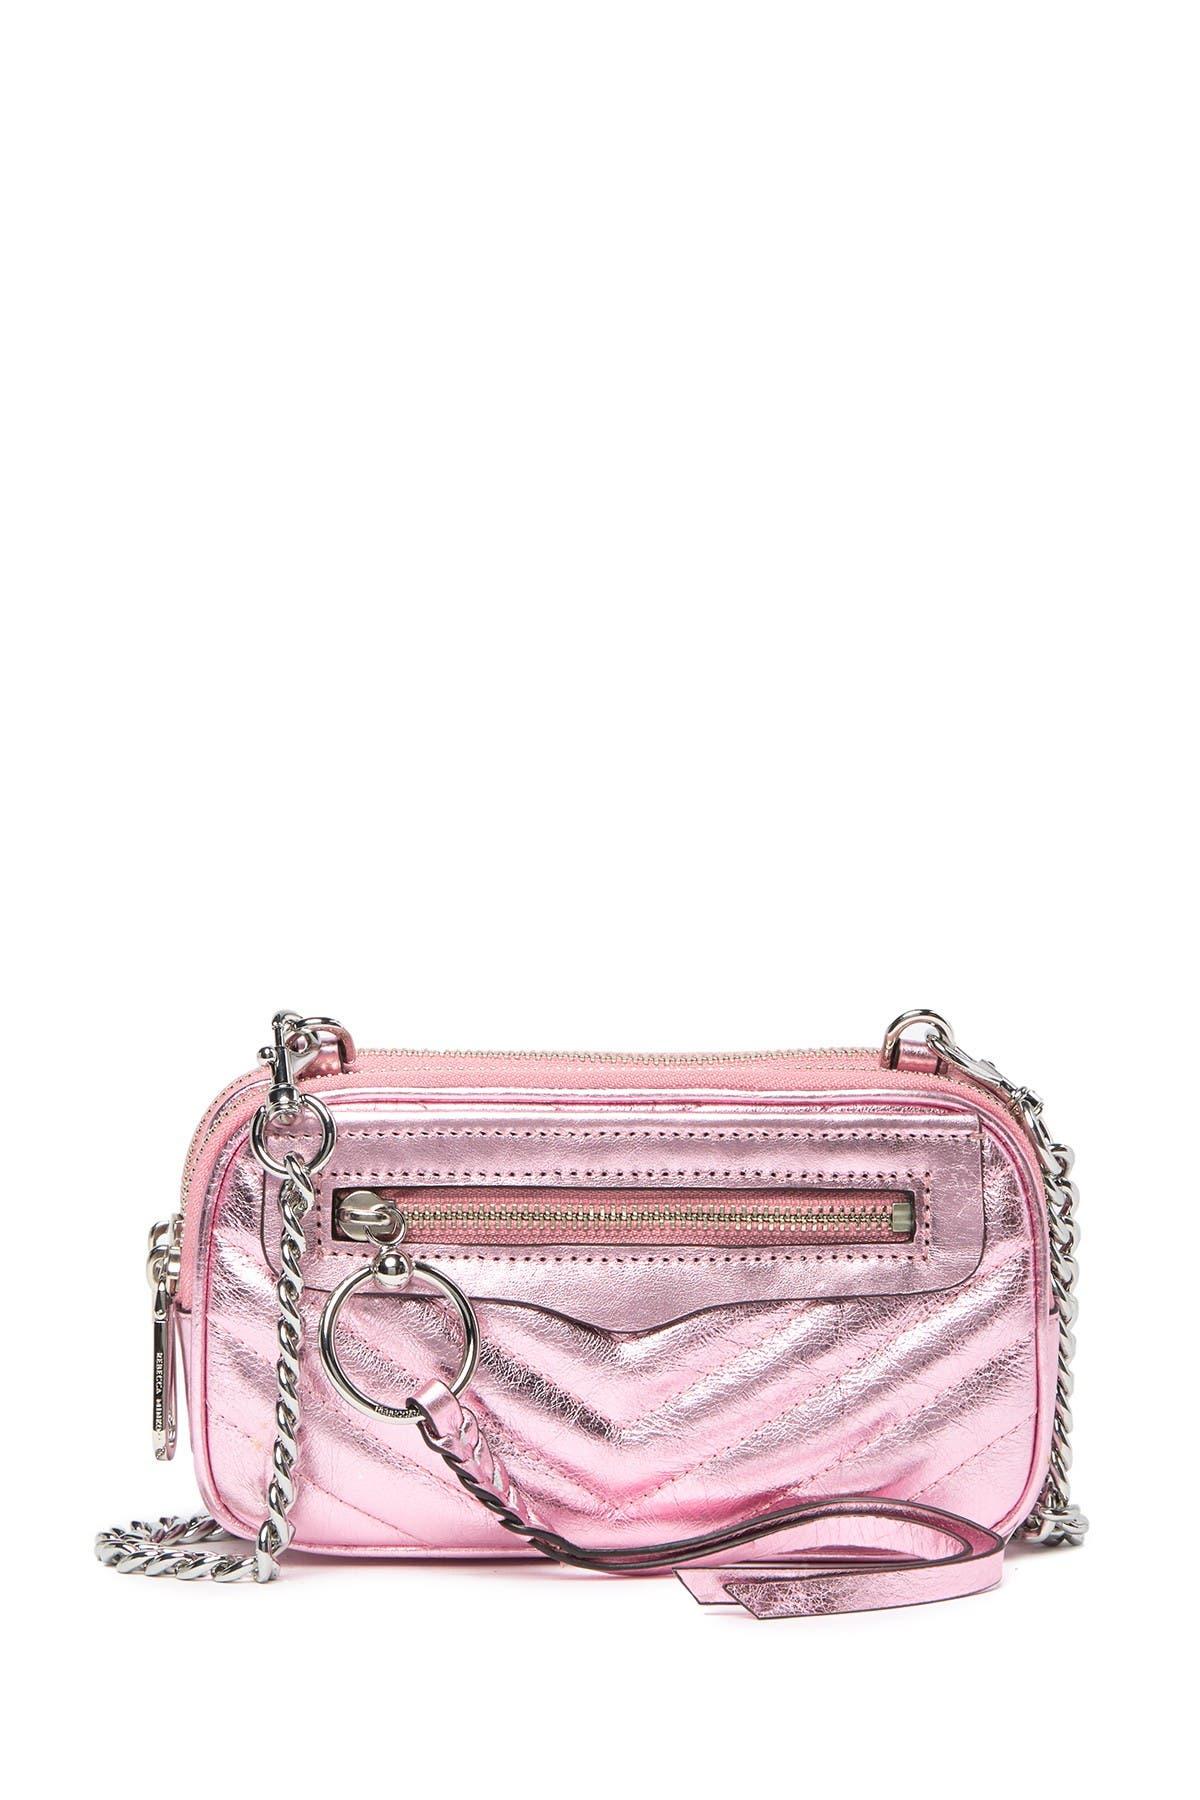 Image of Rebecca Minkoff Leather Double Zip Crossbody Bag